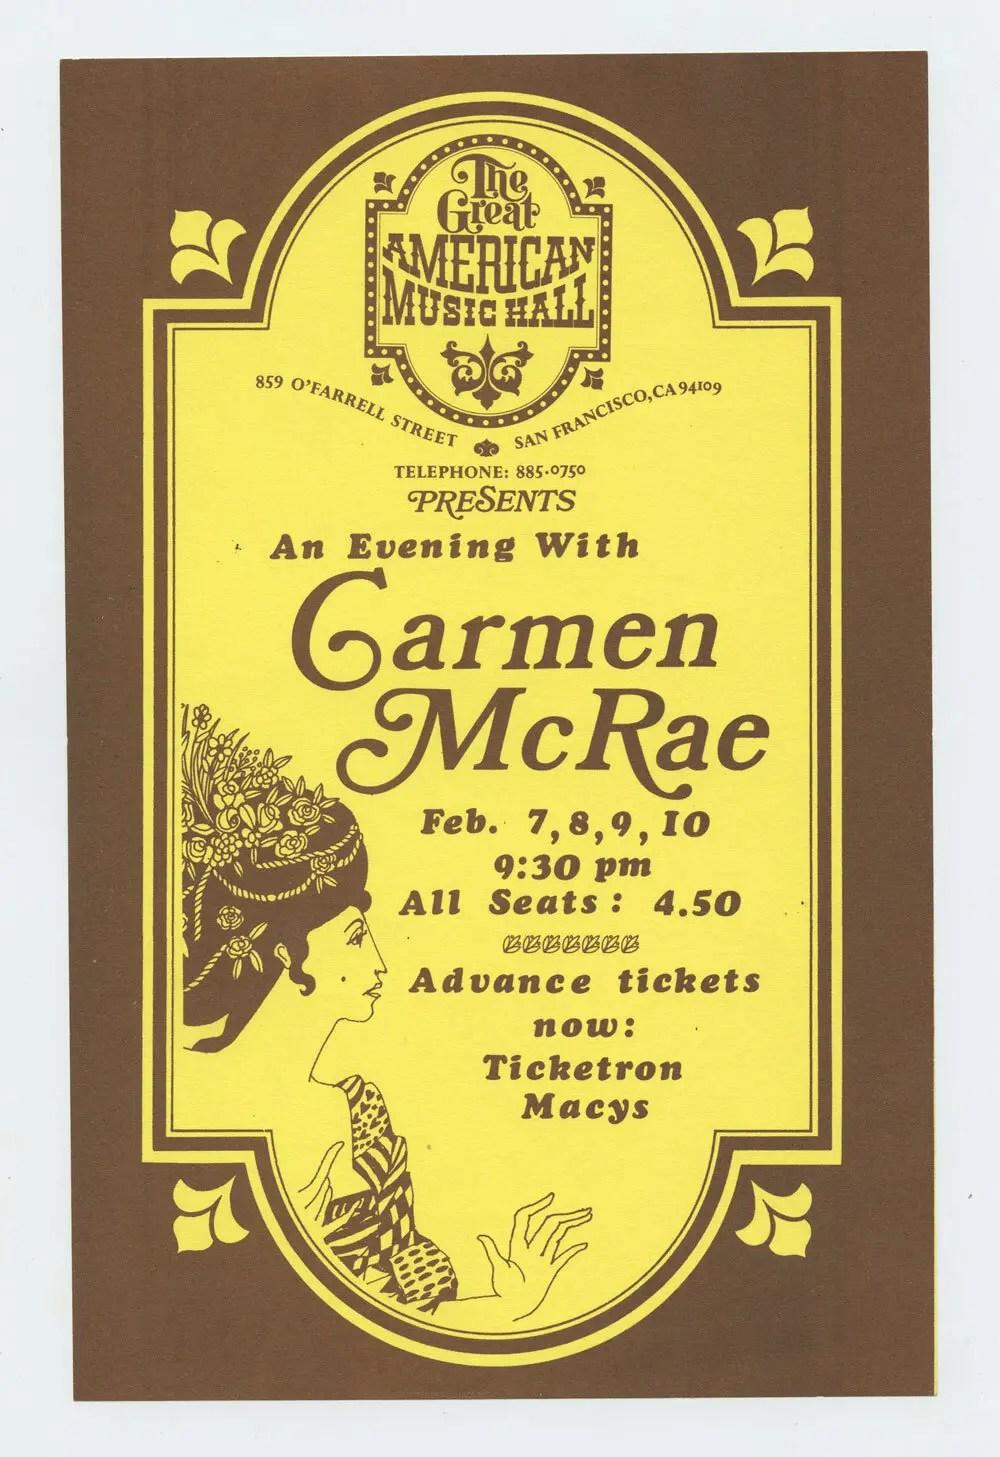 Carmen McRae Handbill 1974 Feb 7 The Great American Music Hall